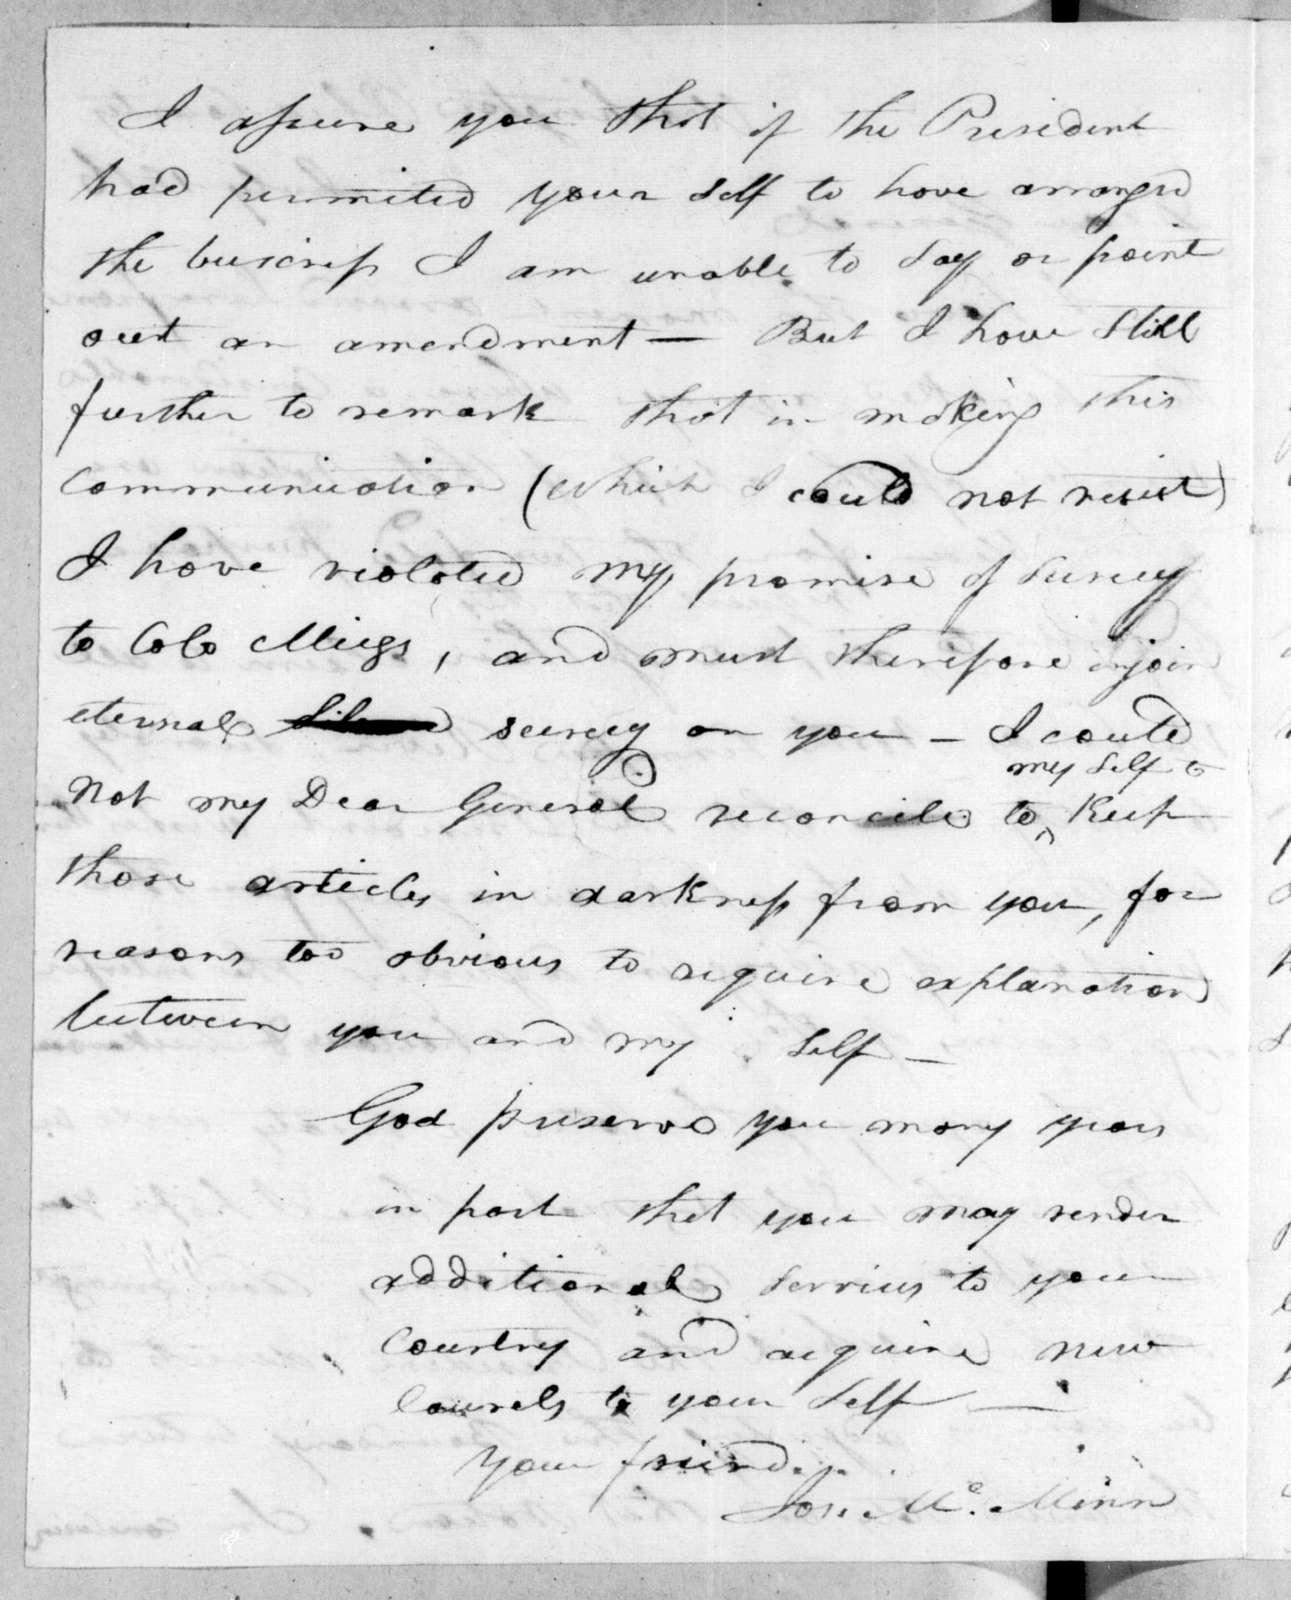 Joseph McMinn to Andrew Jackson, July 25, 1816